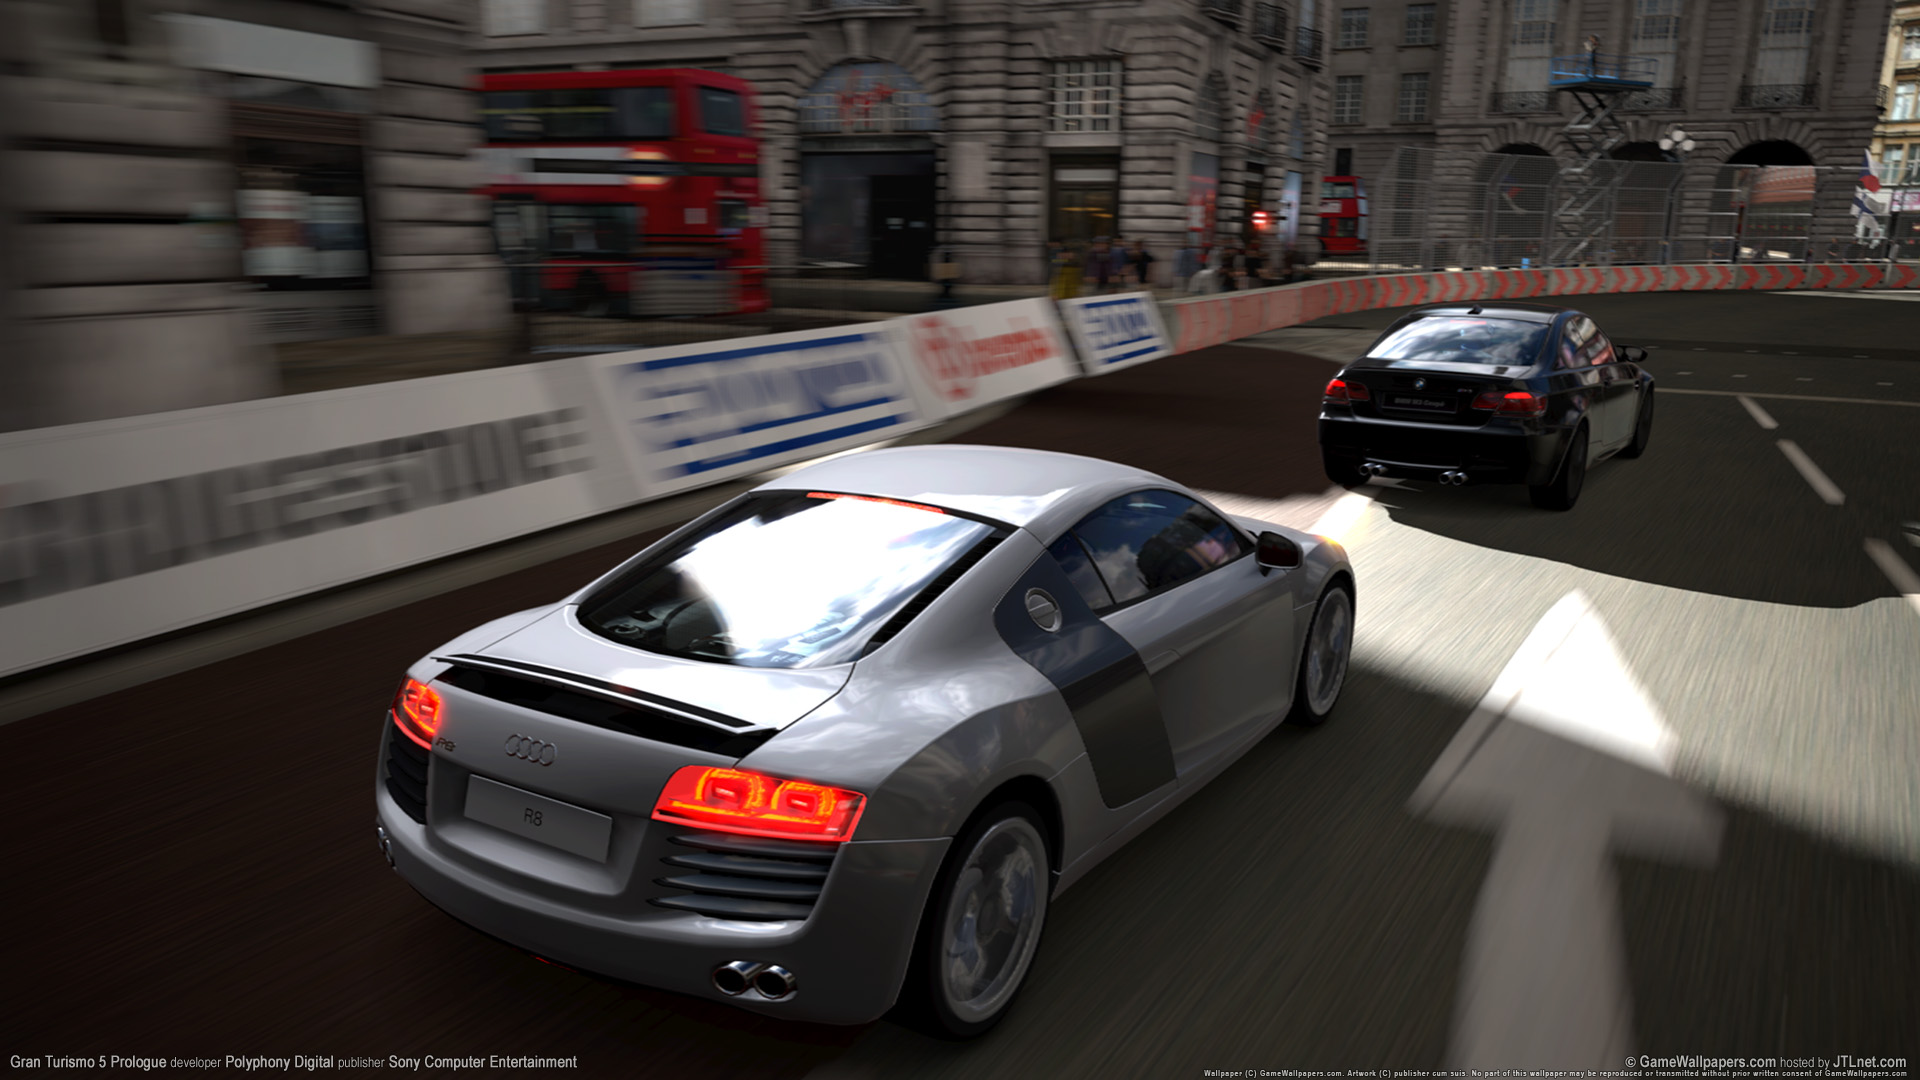 HD Wallpapers Gran Turismo 5 Prologue Game